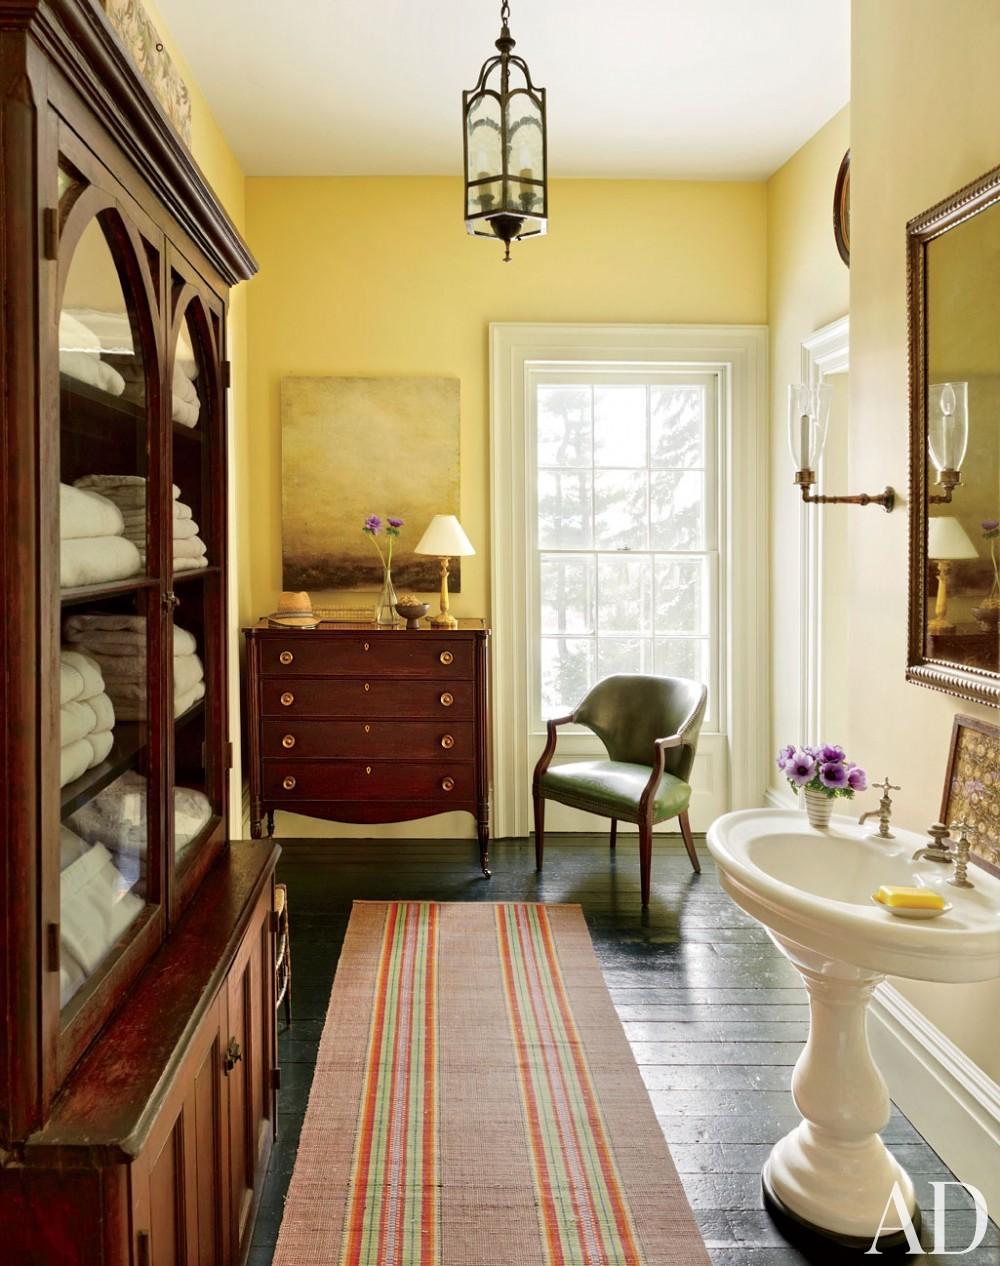 Traditional Bathroom by Hottenroth + Joseph Architects and Hottenroth + Joseph Architects in Livingston, New York